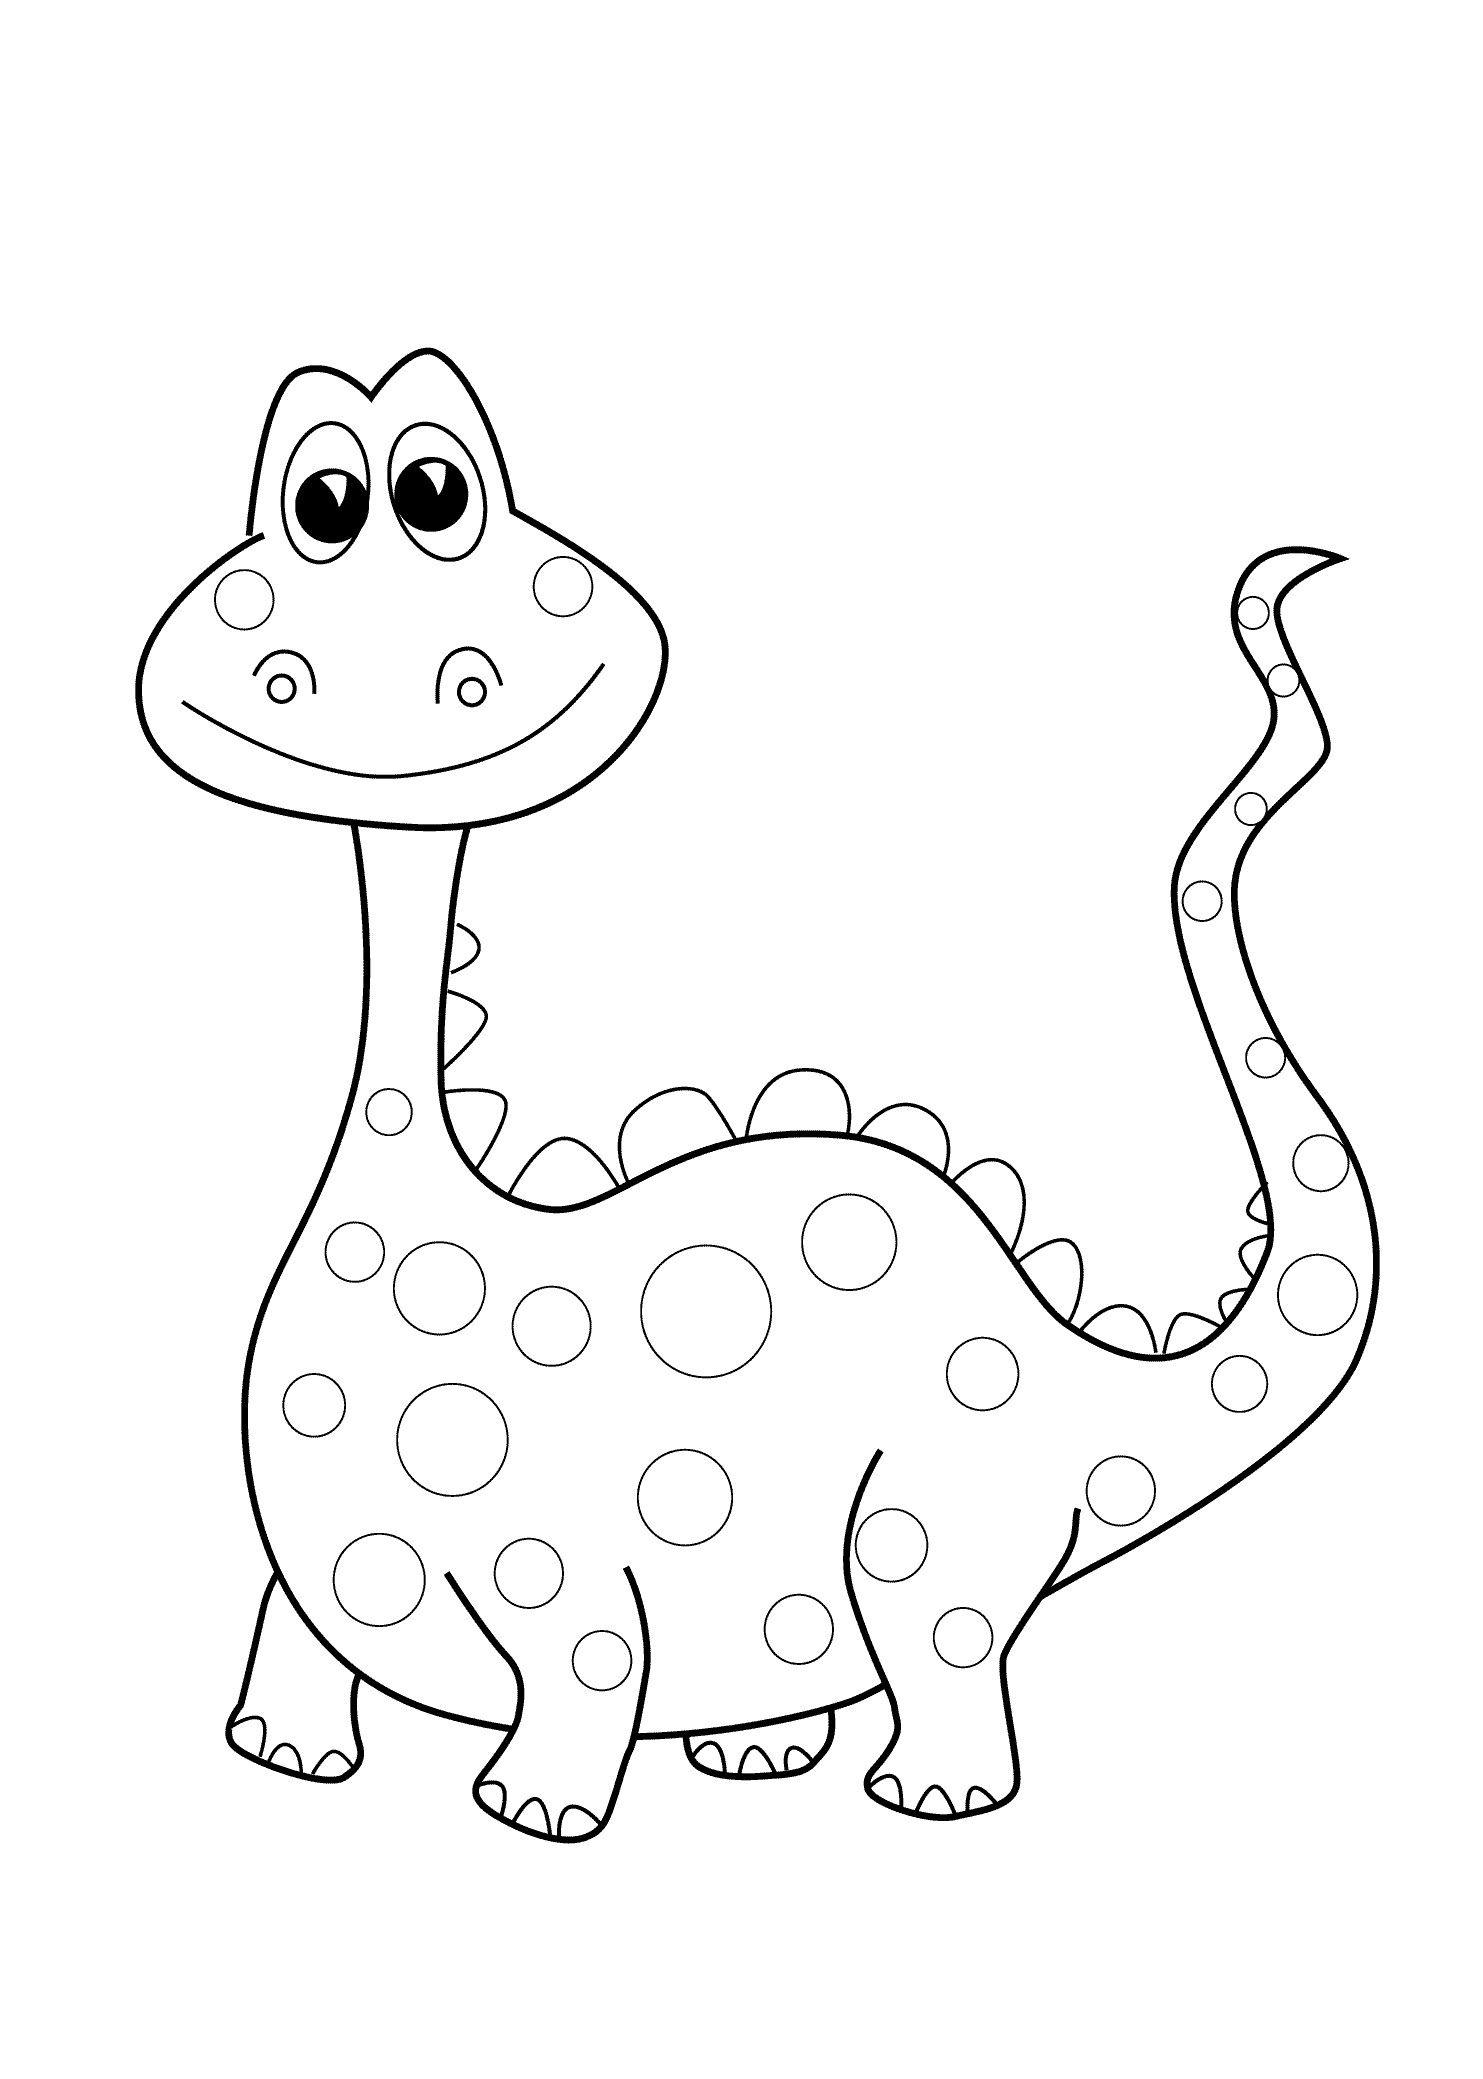 Dinosaur Coloring Pages For Kindergarten Dinosaur